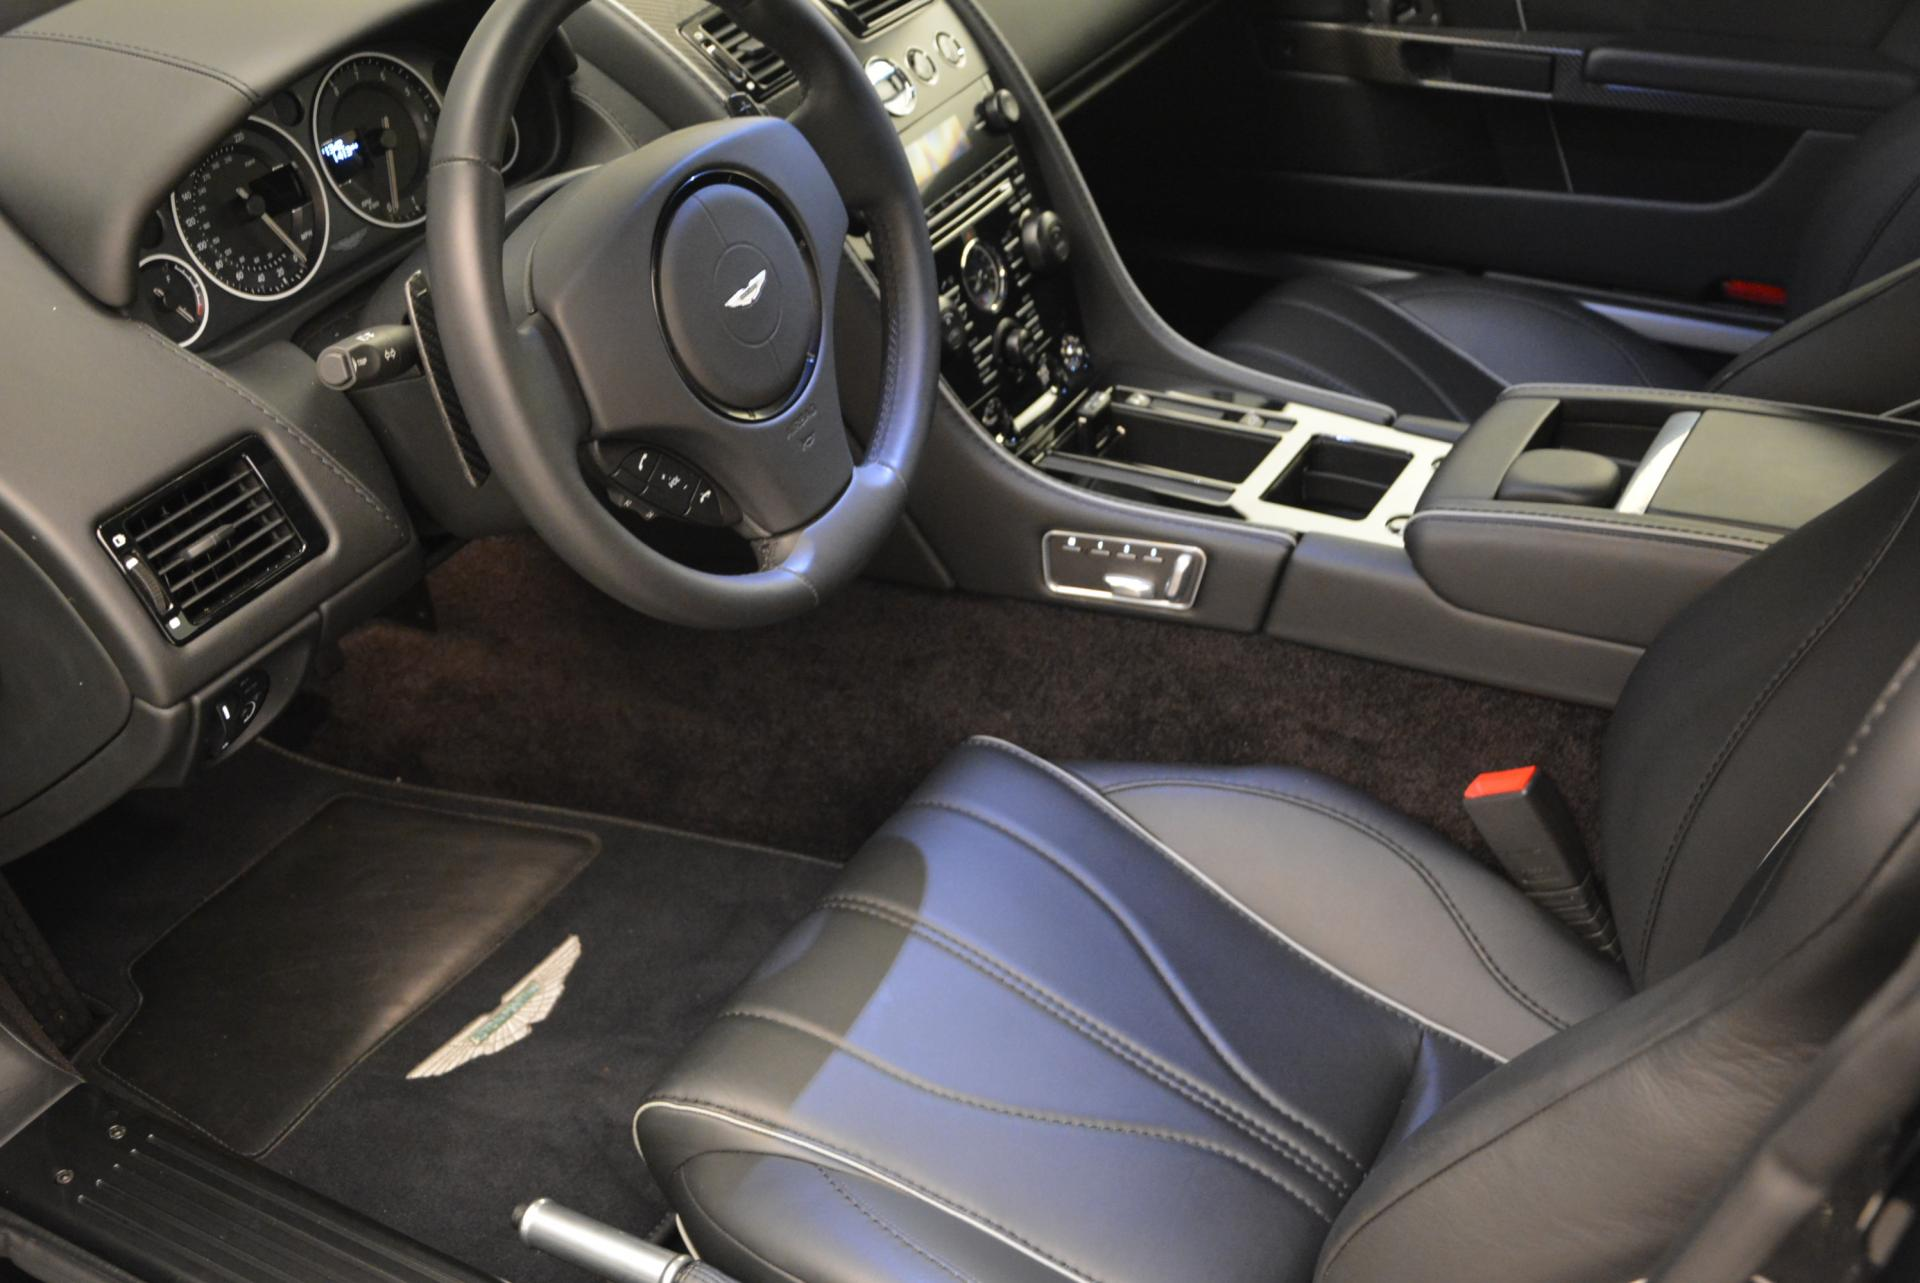 Used 2015 Aston Martin DB9 Carbon Edition For Sale In Greenwich, CT. Alfa Romeo of Greenwich, 7349 528_p13